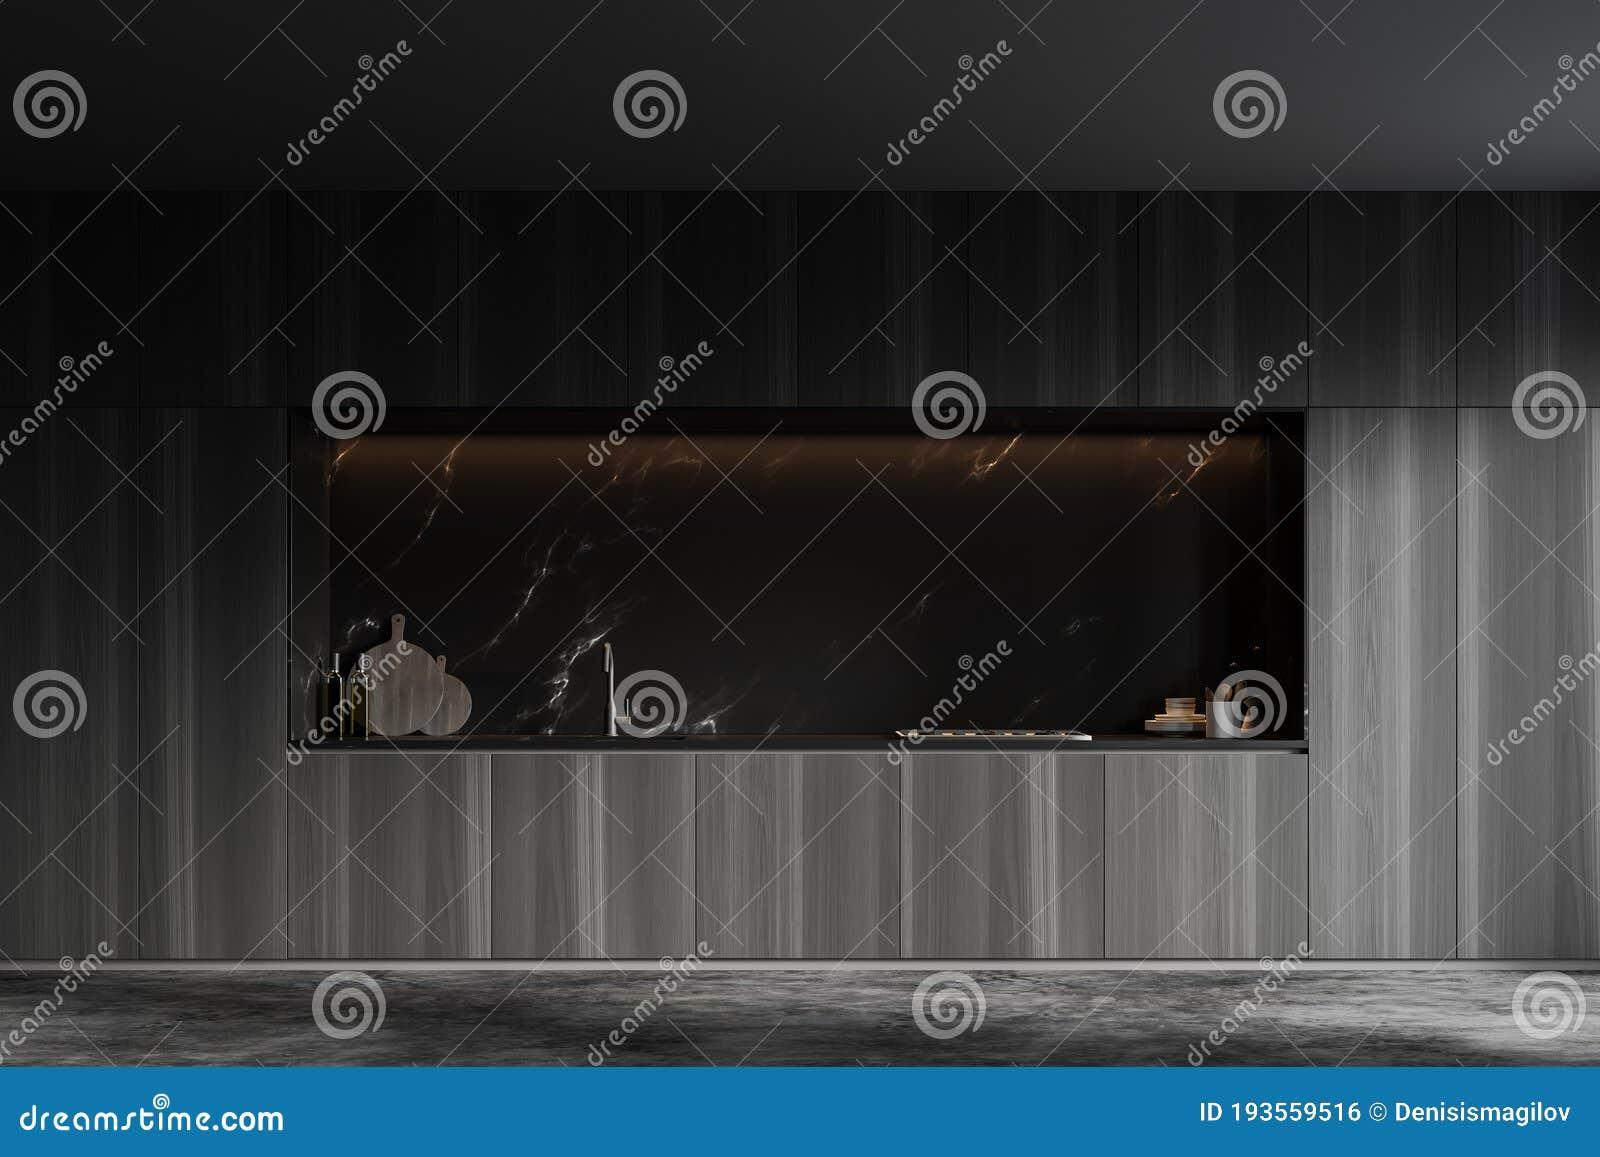 Cabinets In Black Marble Kitchen Stock Illustration Illustration Of Design Decor 193559516